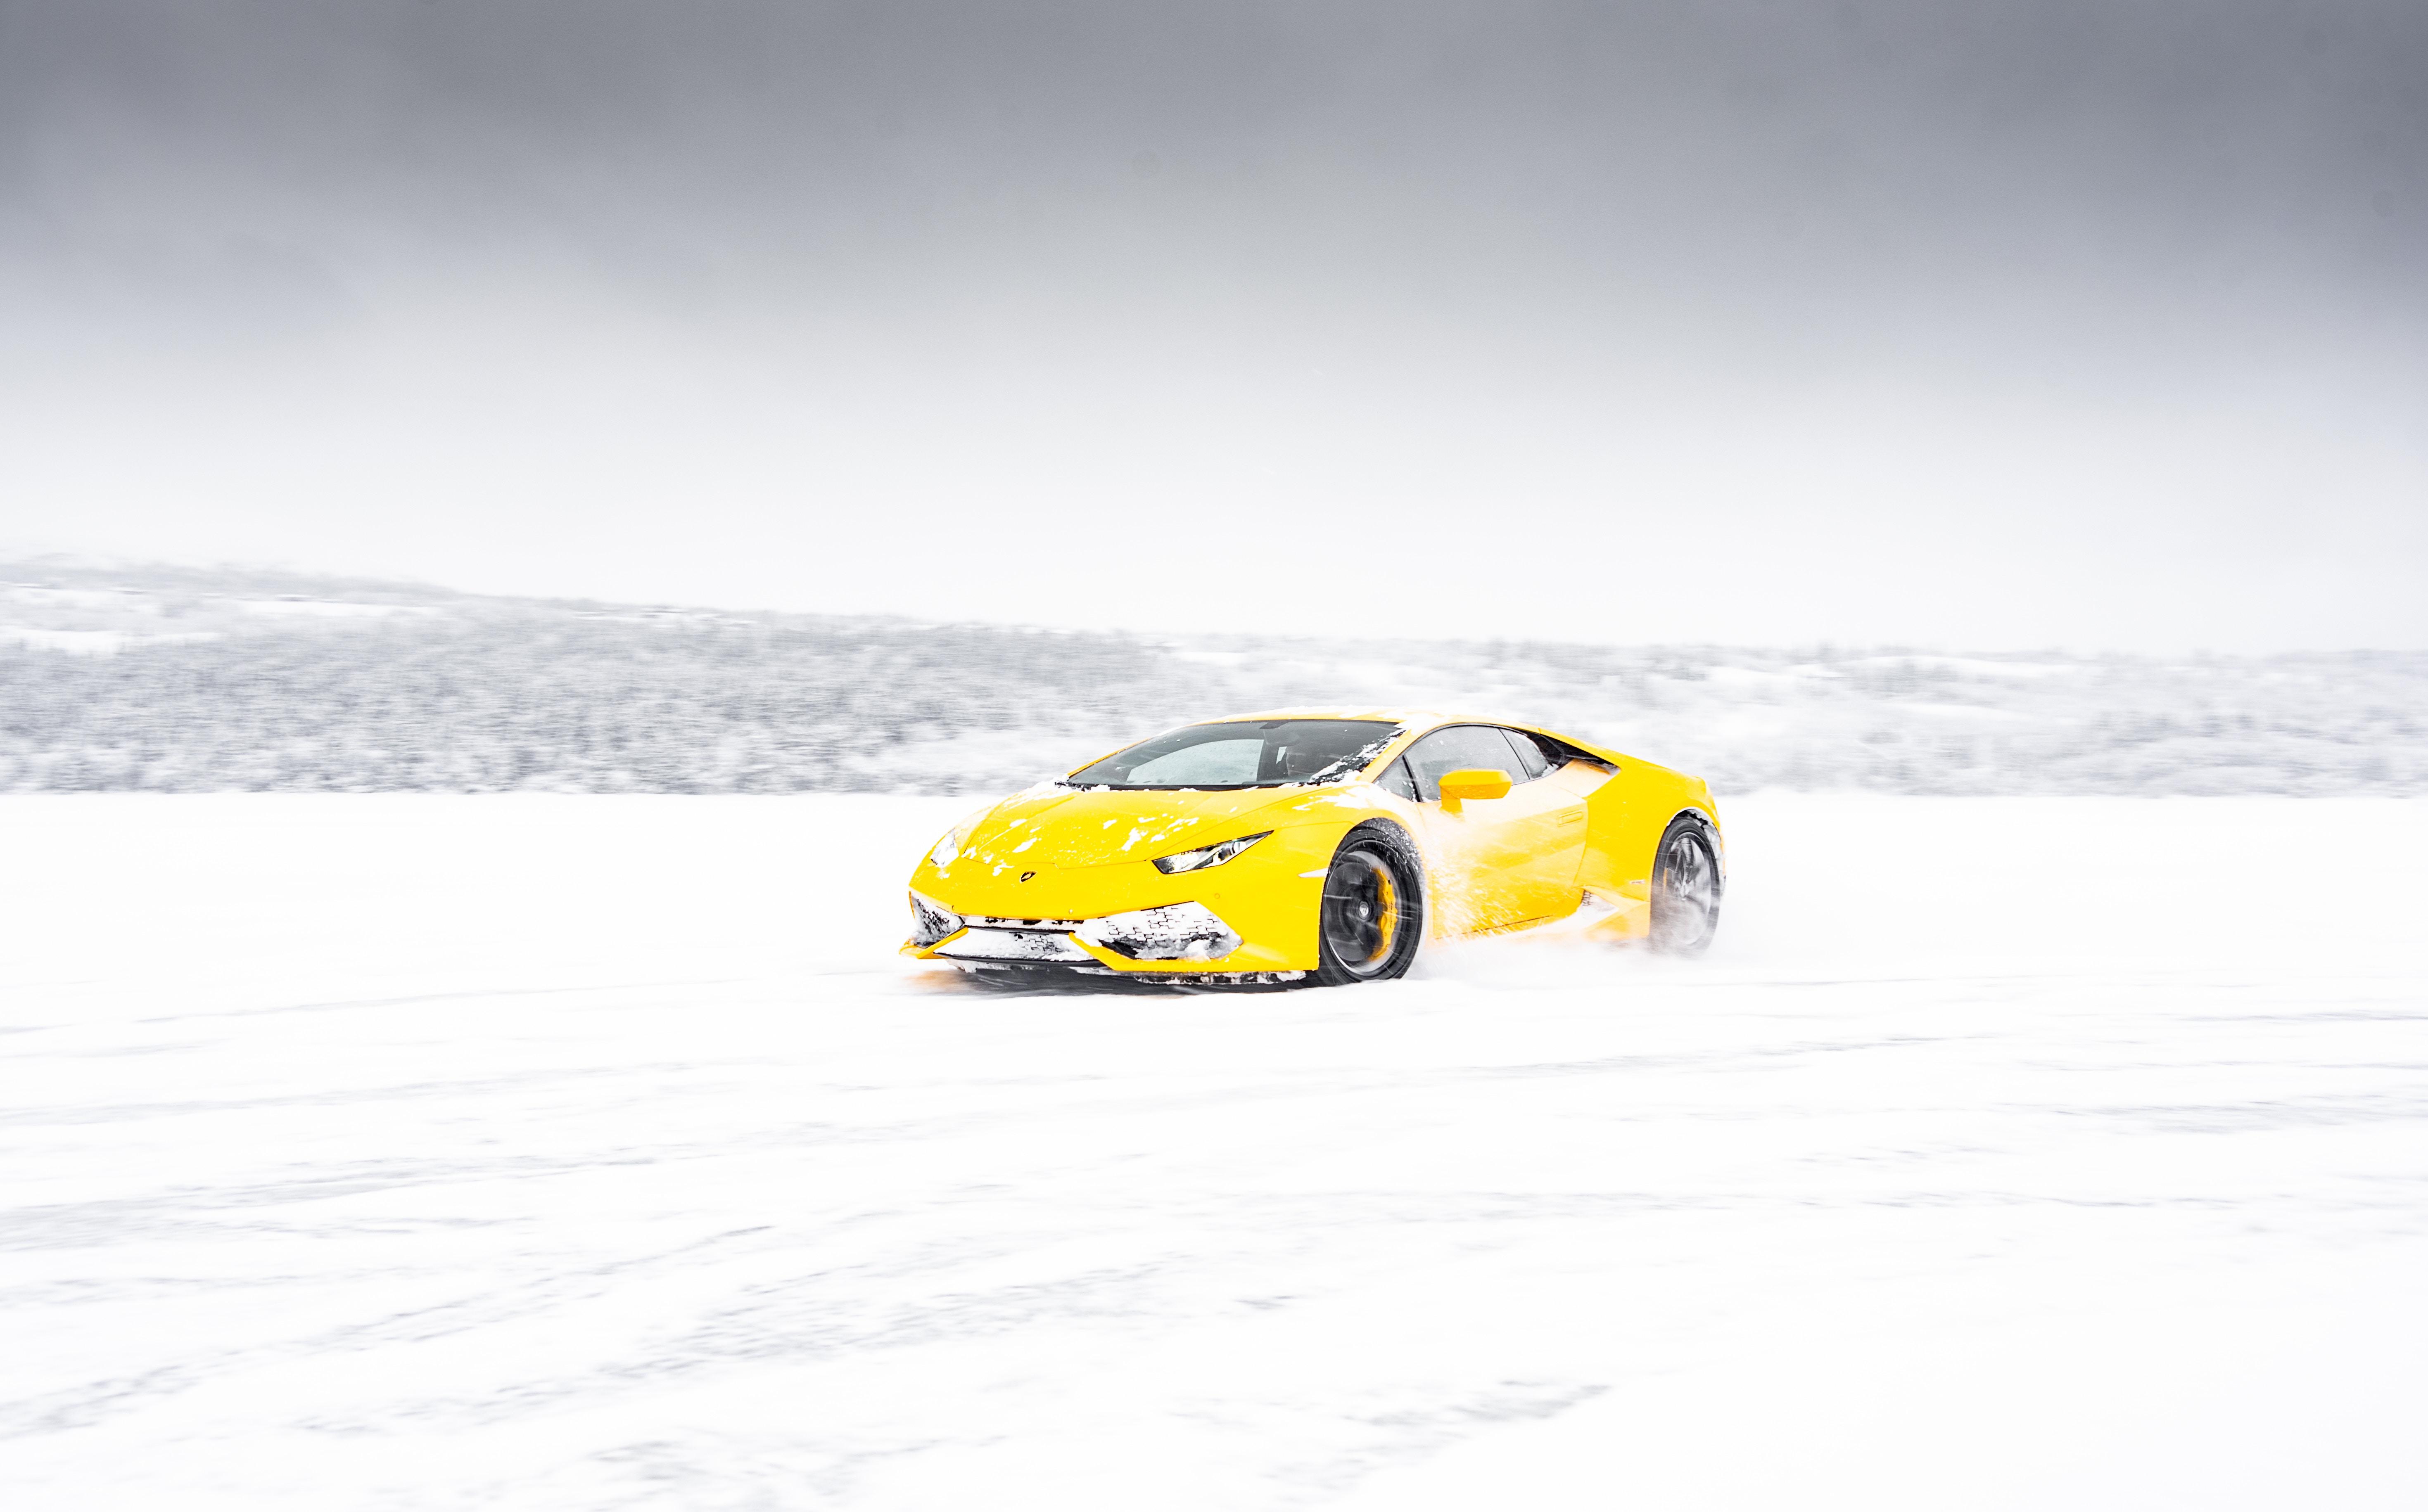 yellow lamborghini aventador in snow 1574939499 - Yellow Lamborghini Aventador In Snow -